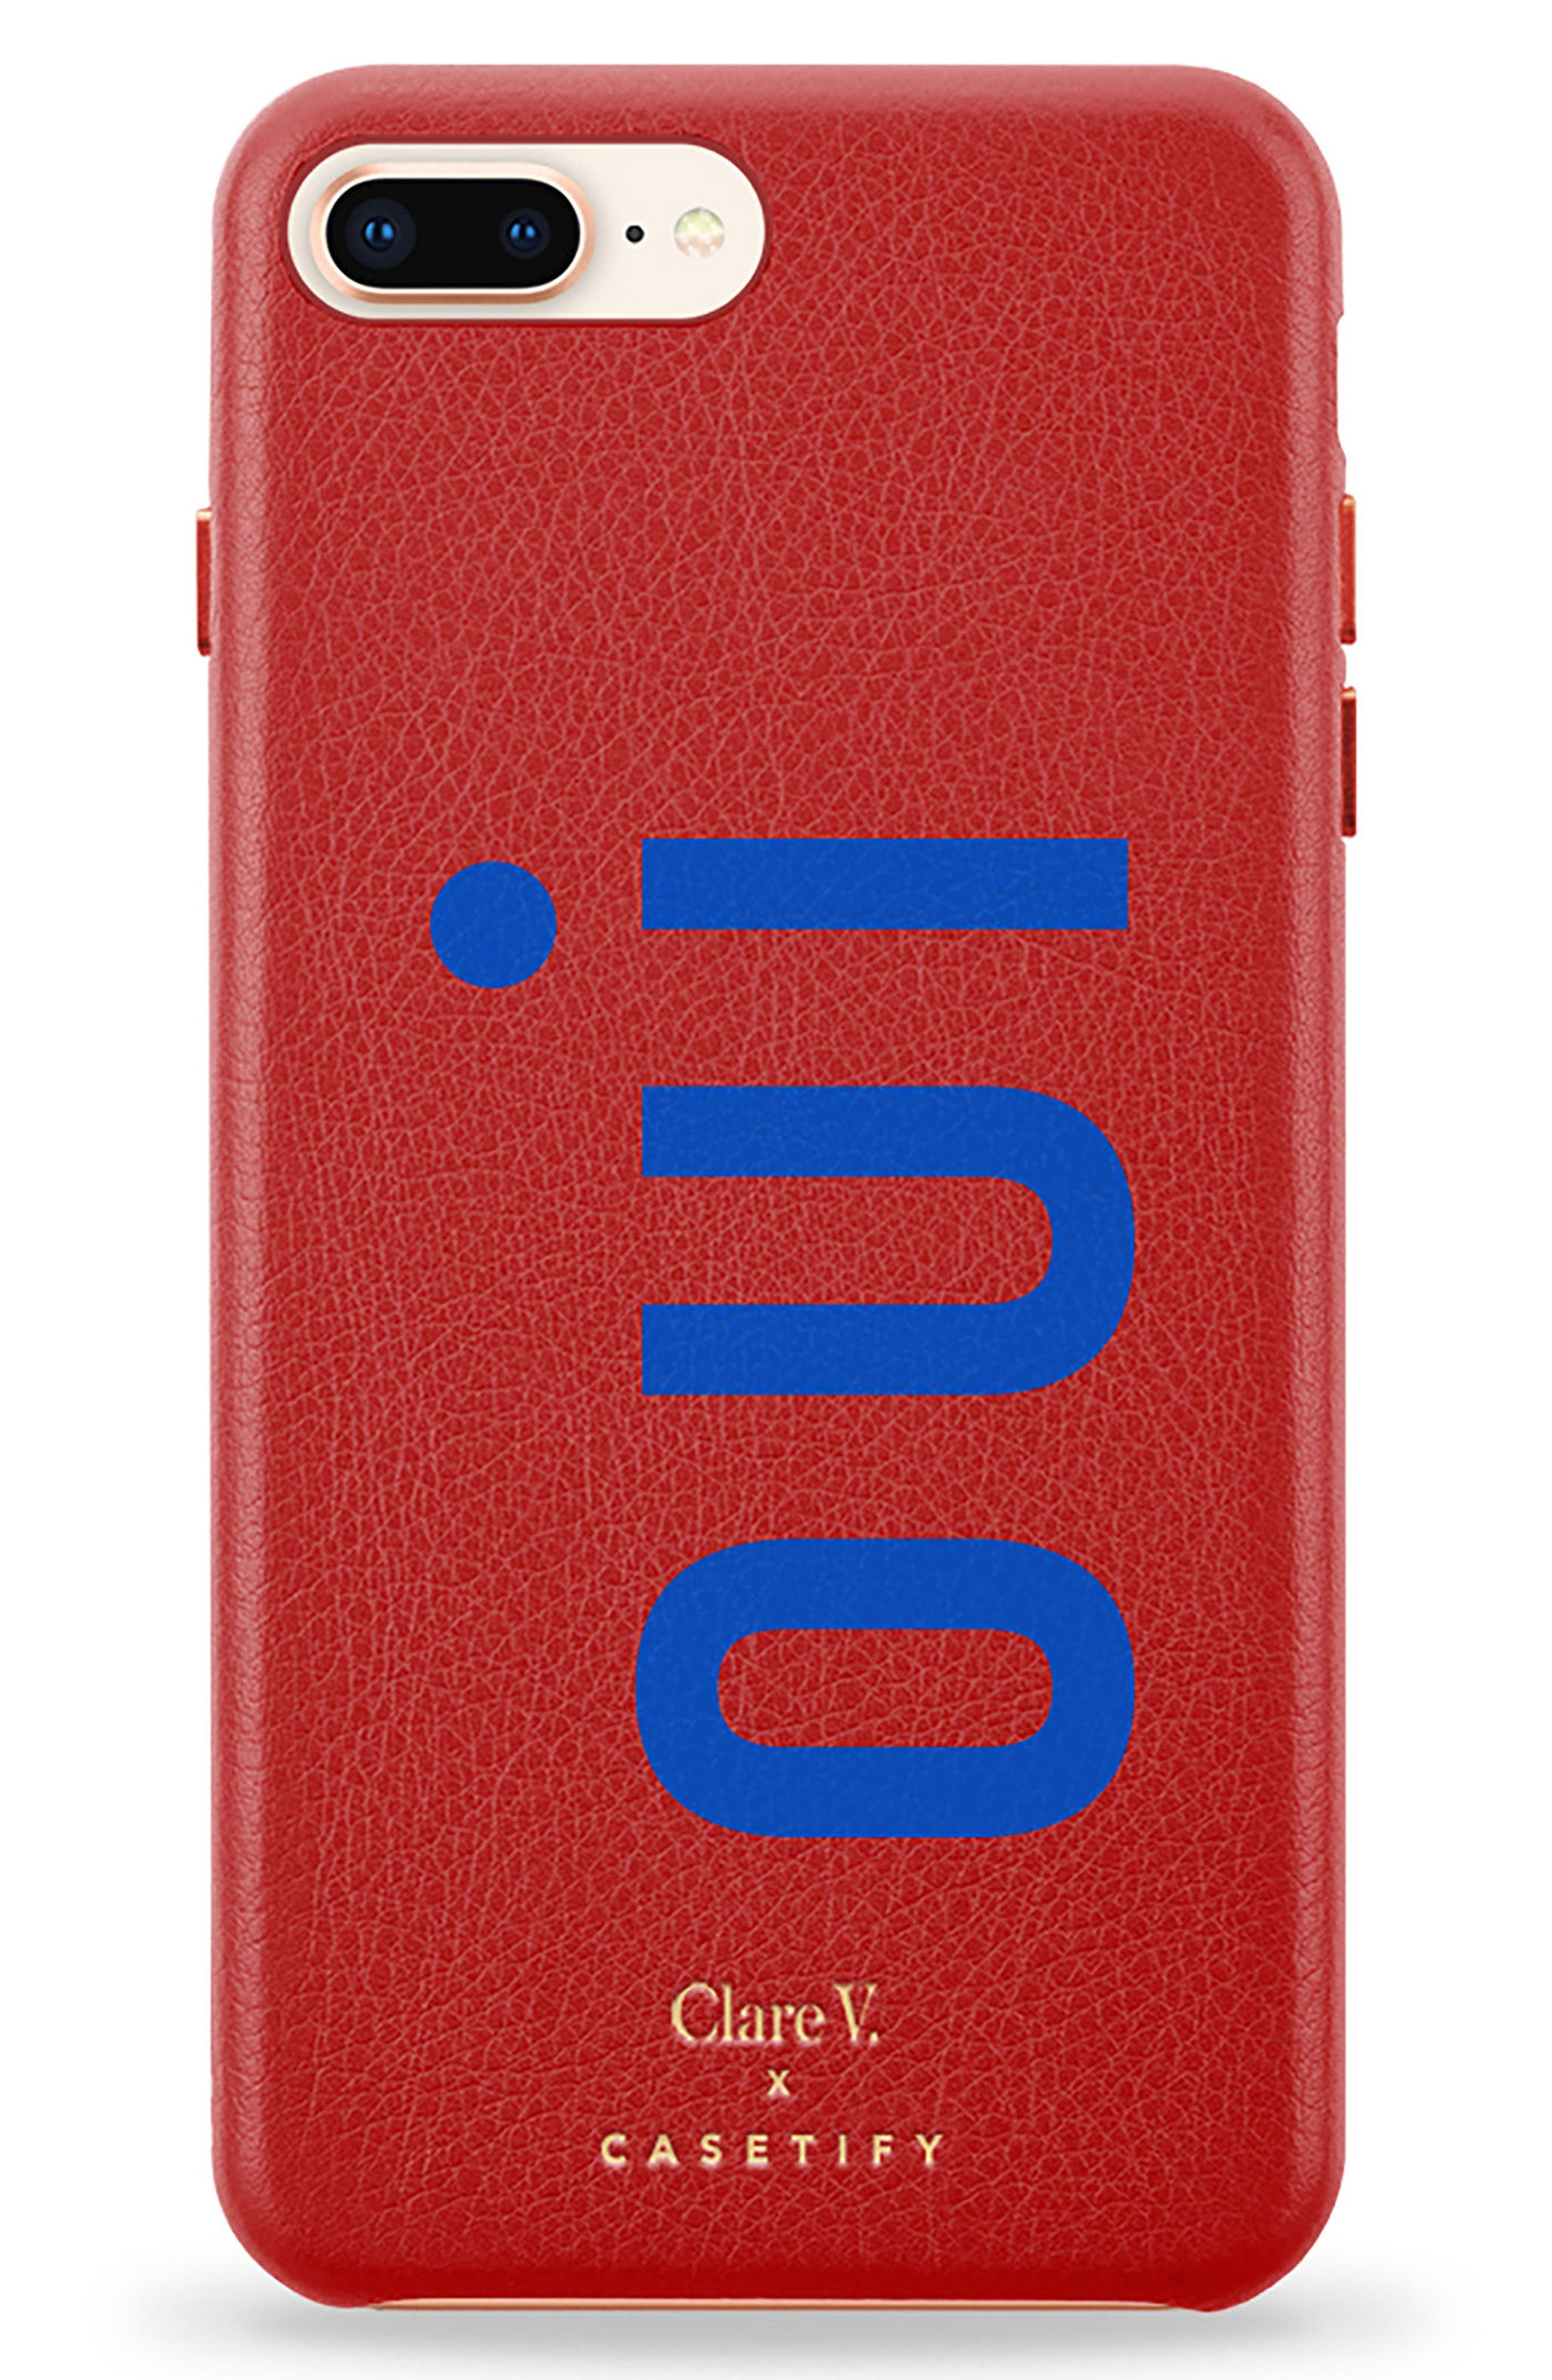 x Clare V. Oui Leather iPhone 7/8 & 7/8 Plus Case,                         Main,                         color, 600